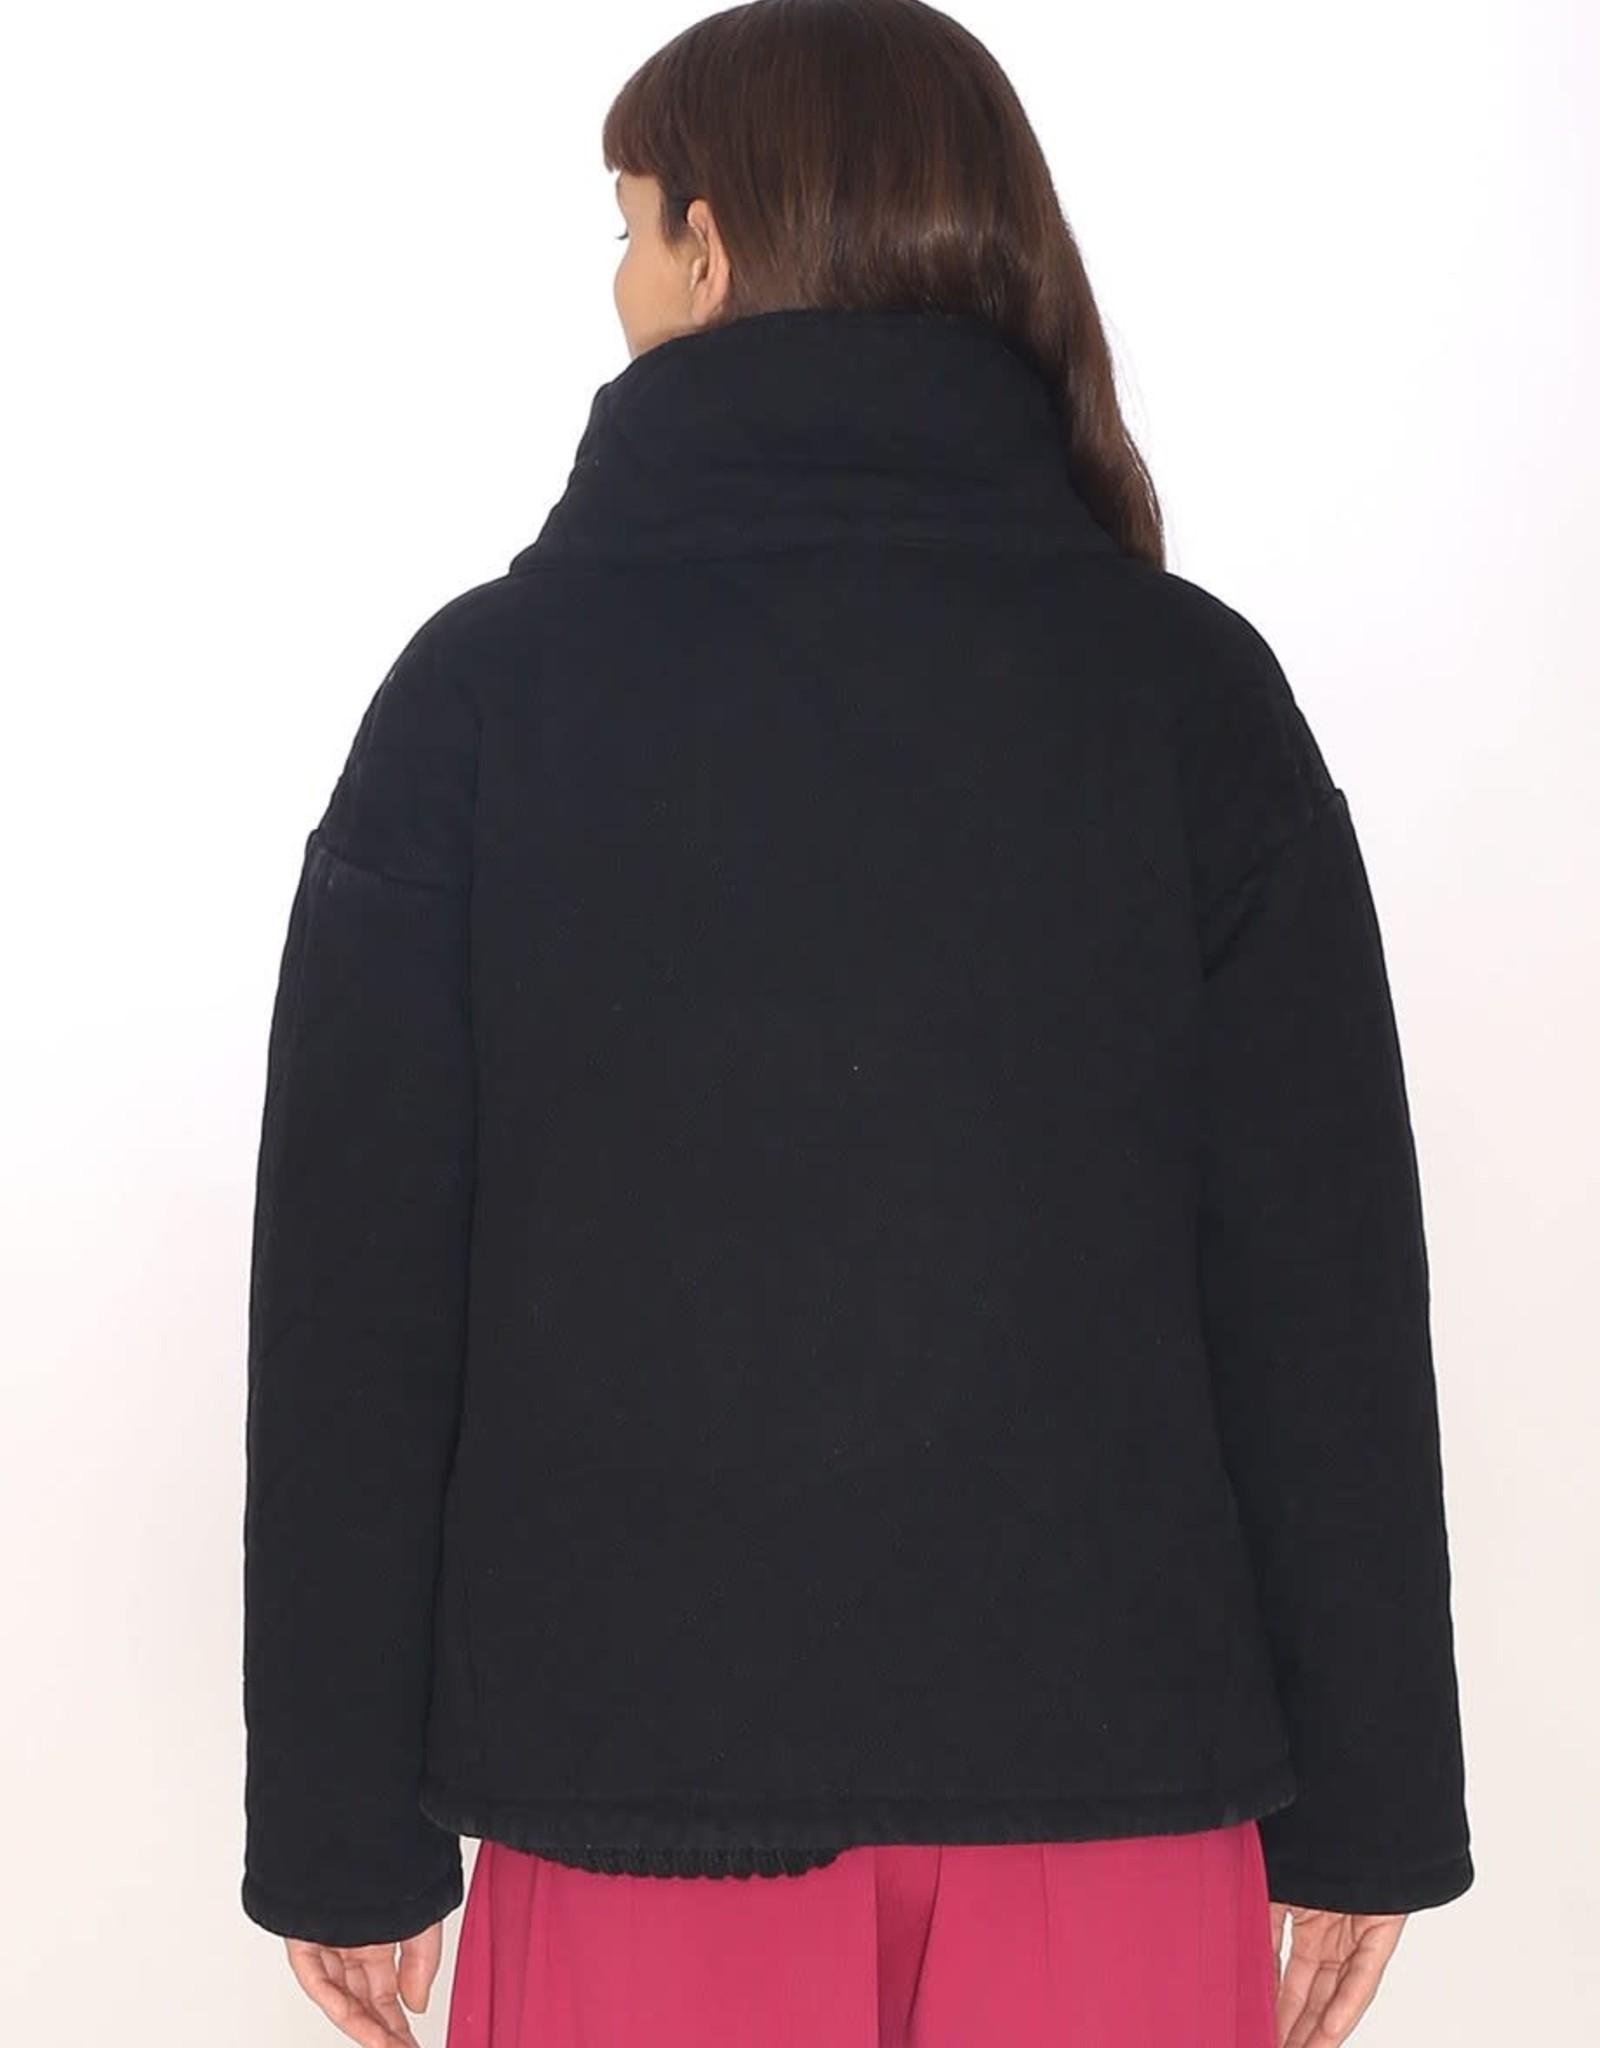 Pepaloves Pepaloves 110155 Short Jacket With Snaps